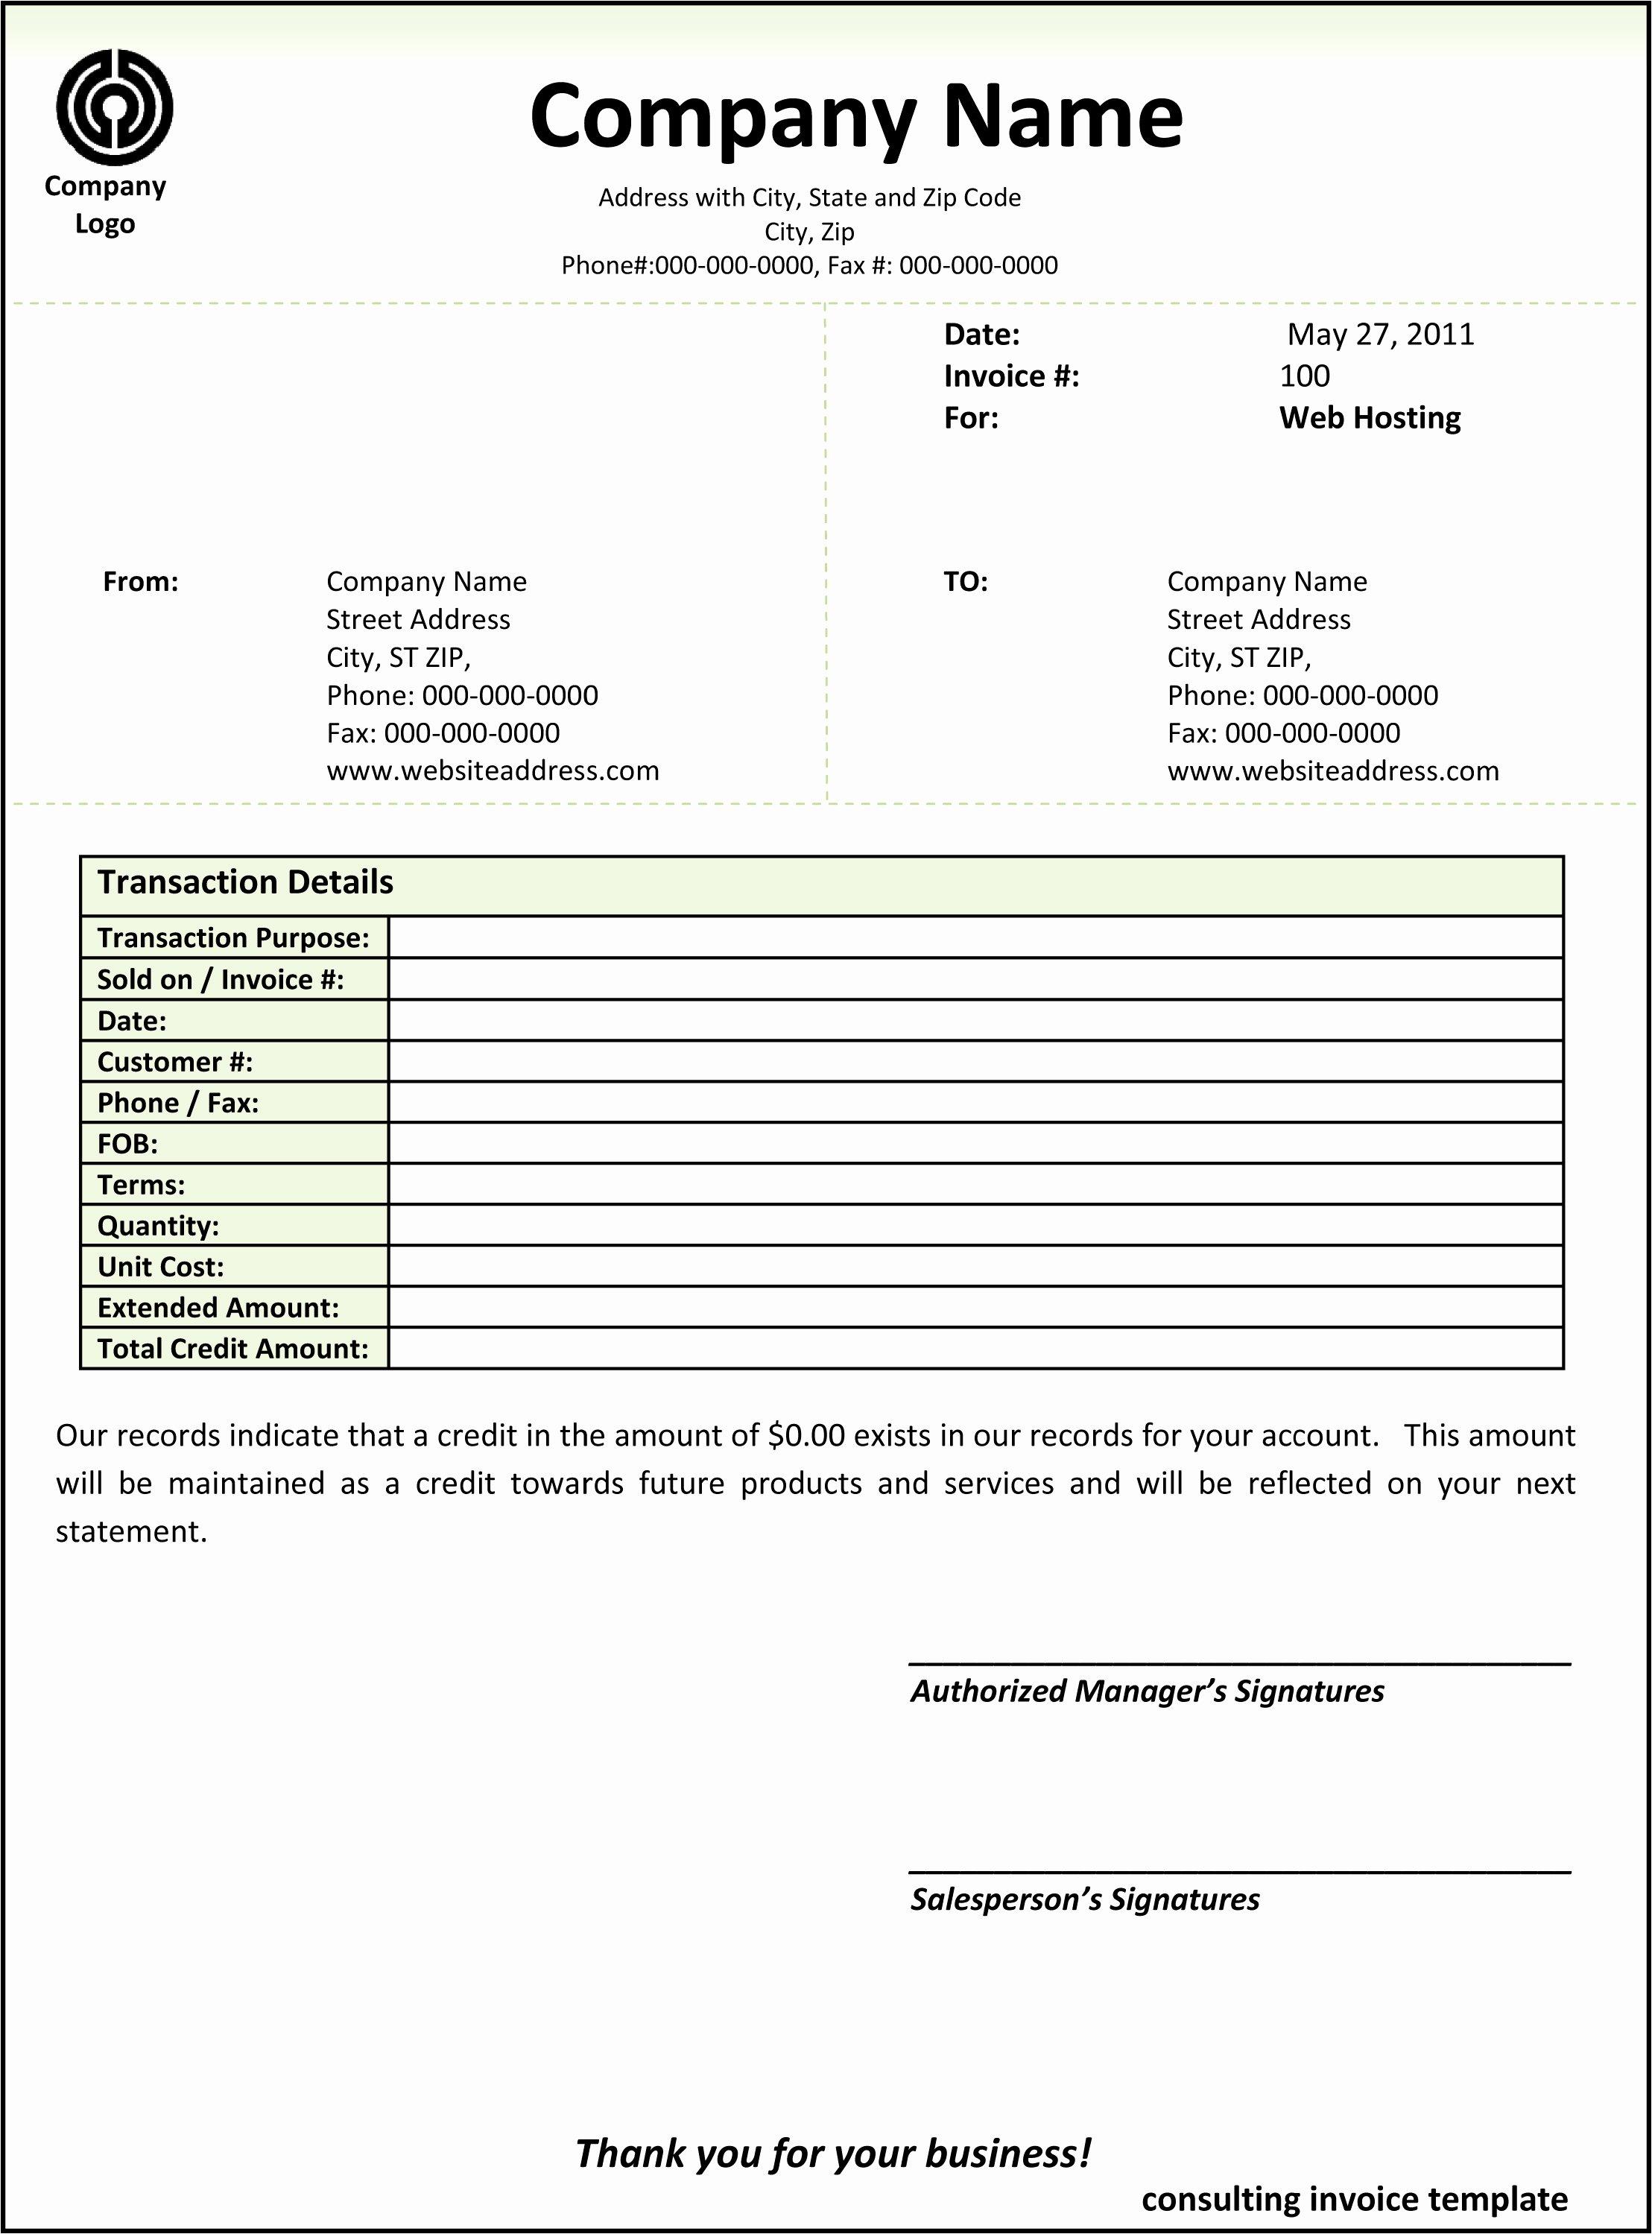 Consulting Invoice Template Word Elegant Consulting Invoice Template Word